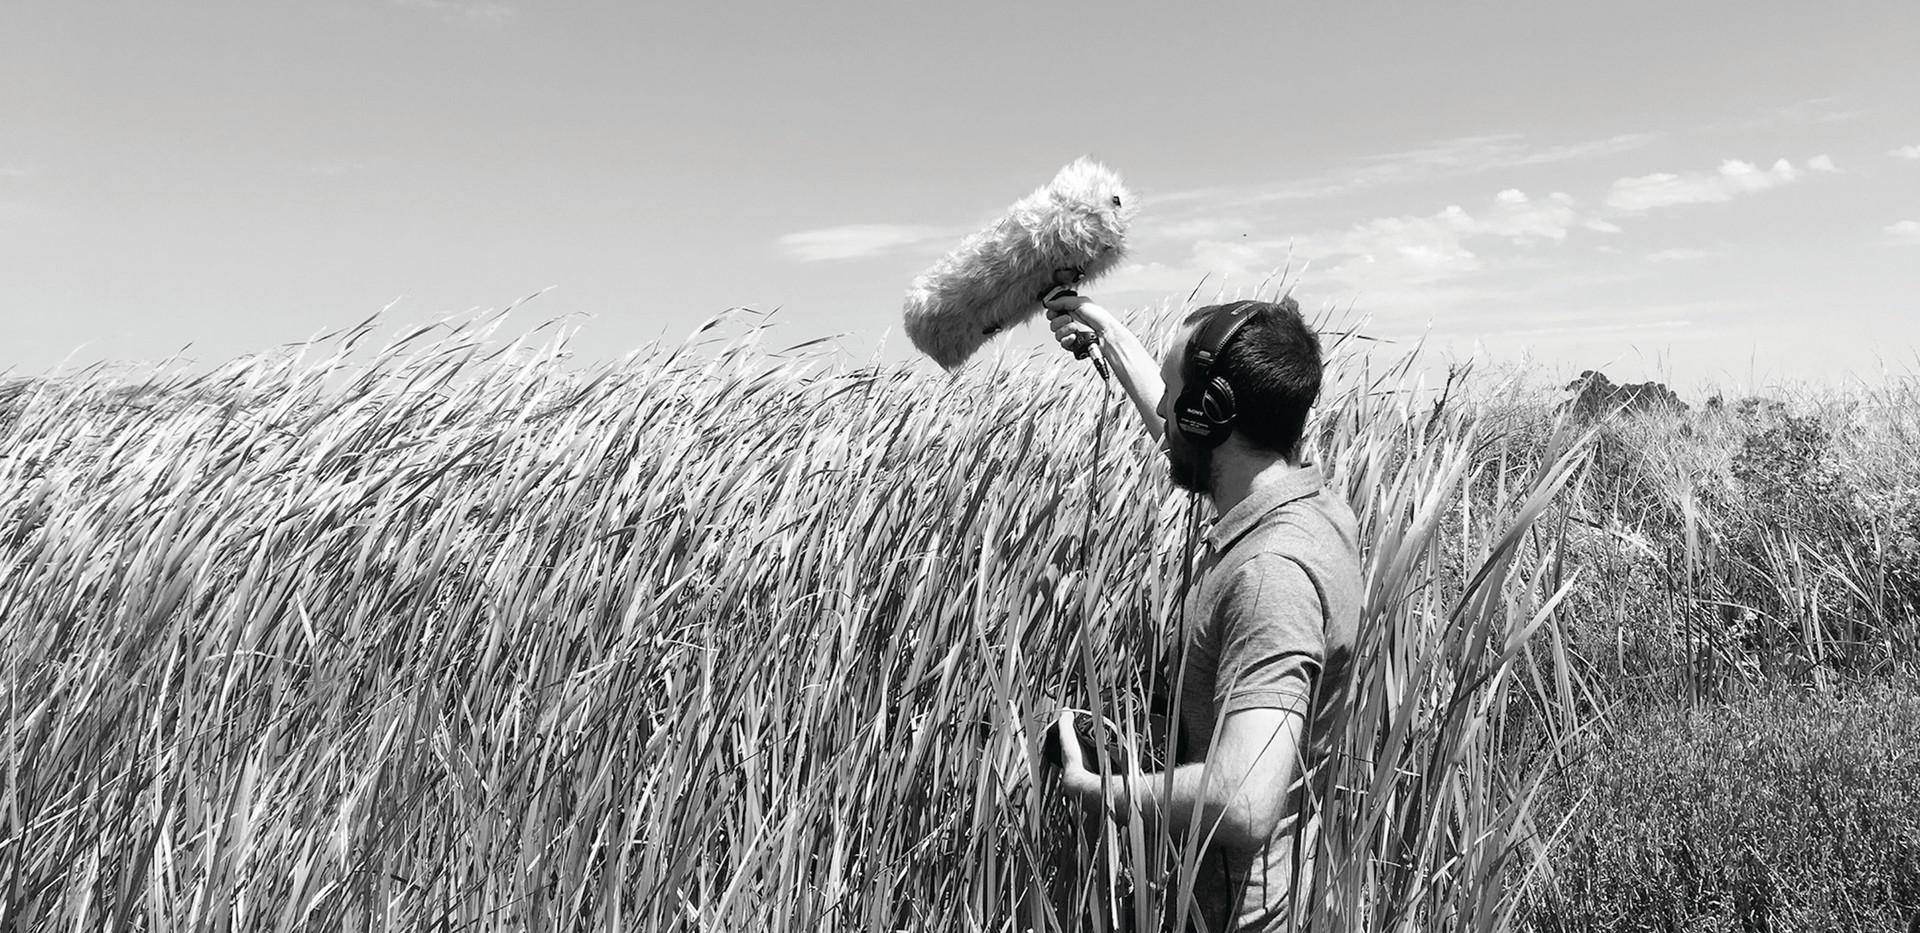 KEVIN CORCORAN / Musician / Sound Artist (San Francisco)